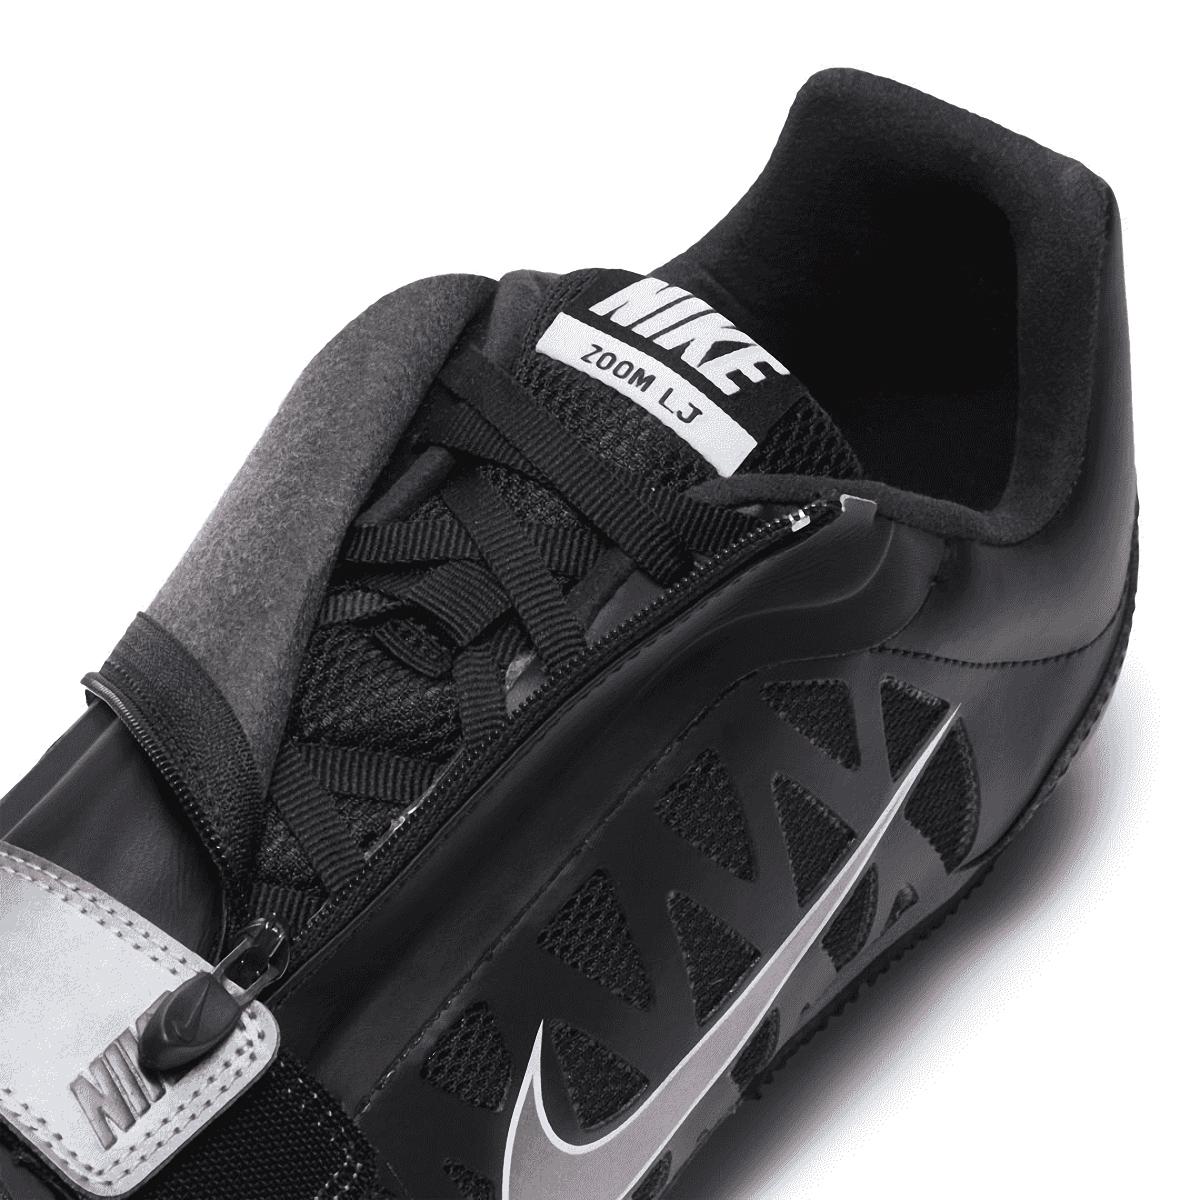 Nike Zoom Long Jump 4 Track Spikes - Color: Black/Indigo Fog/White/Steller Indigo - Size: 4 - Width: Regular, Black/Indigo Fog/White/Steller Indigo, large, image 4